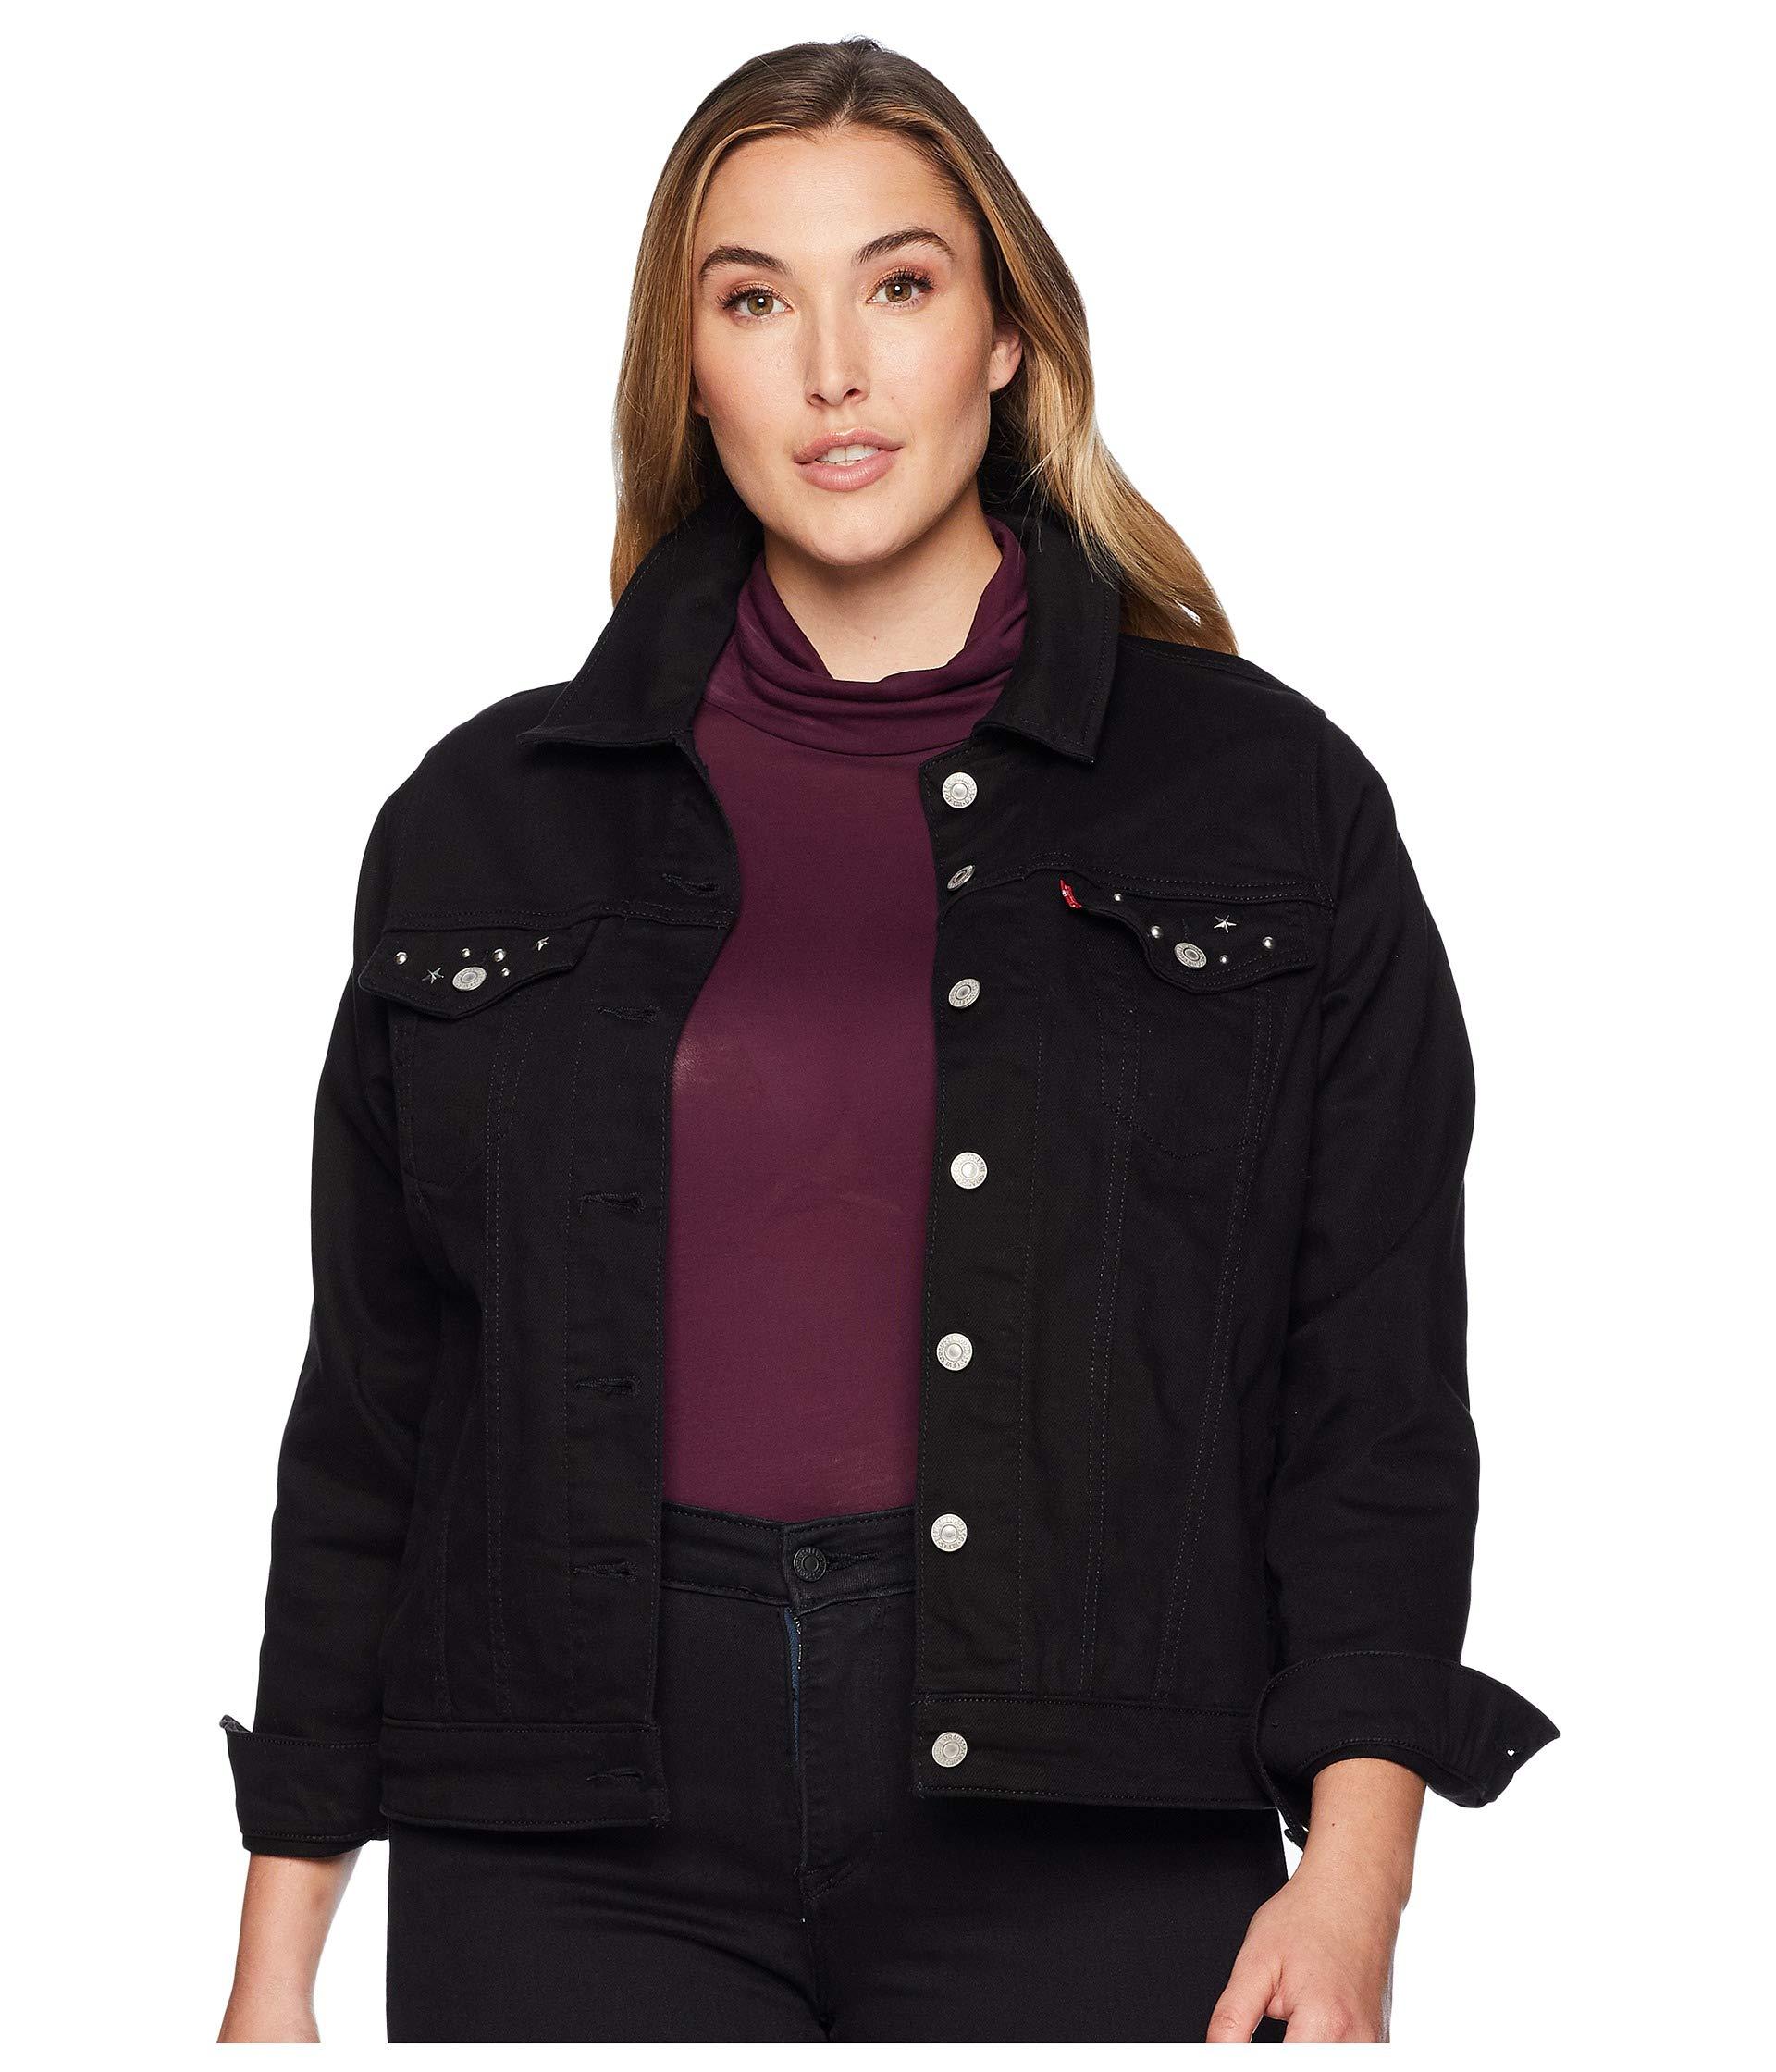 Levi's Women's Plus-Size Original Trucker Jackets, Soft Ultra Black, 3 X